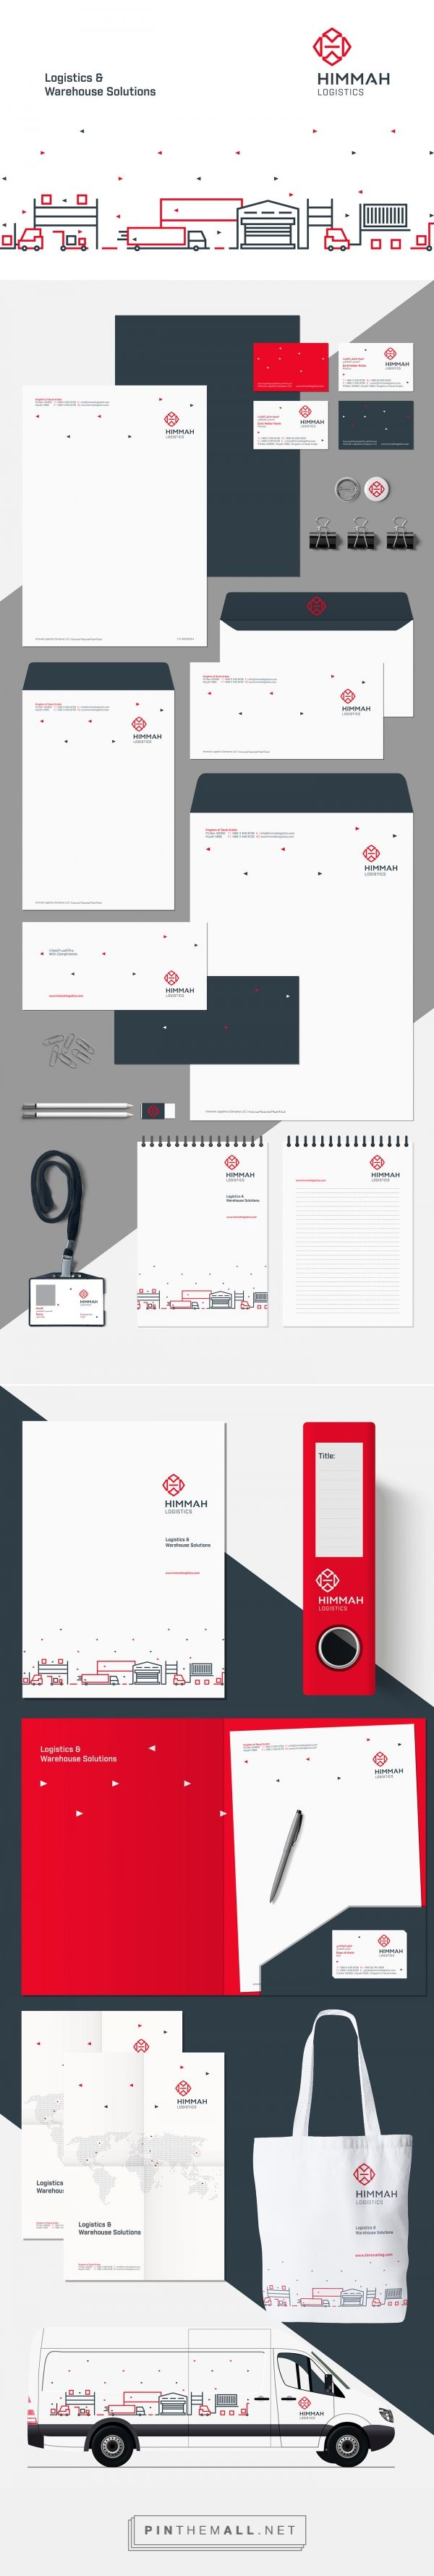 Himmah Logistics Branding on Behance | Fivestar Branding – Design and Branding Agency & Inspiration Gallery